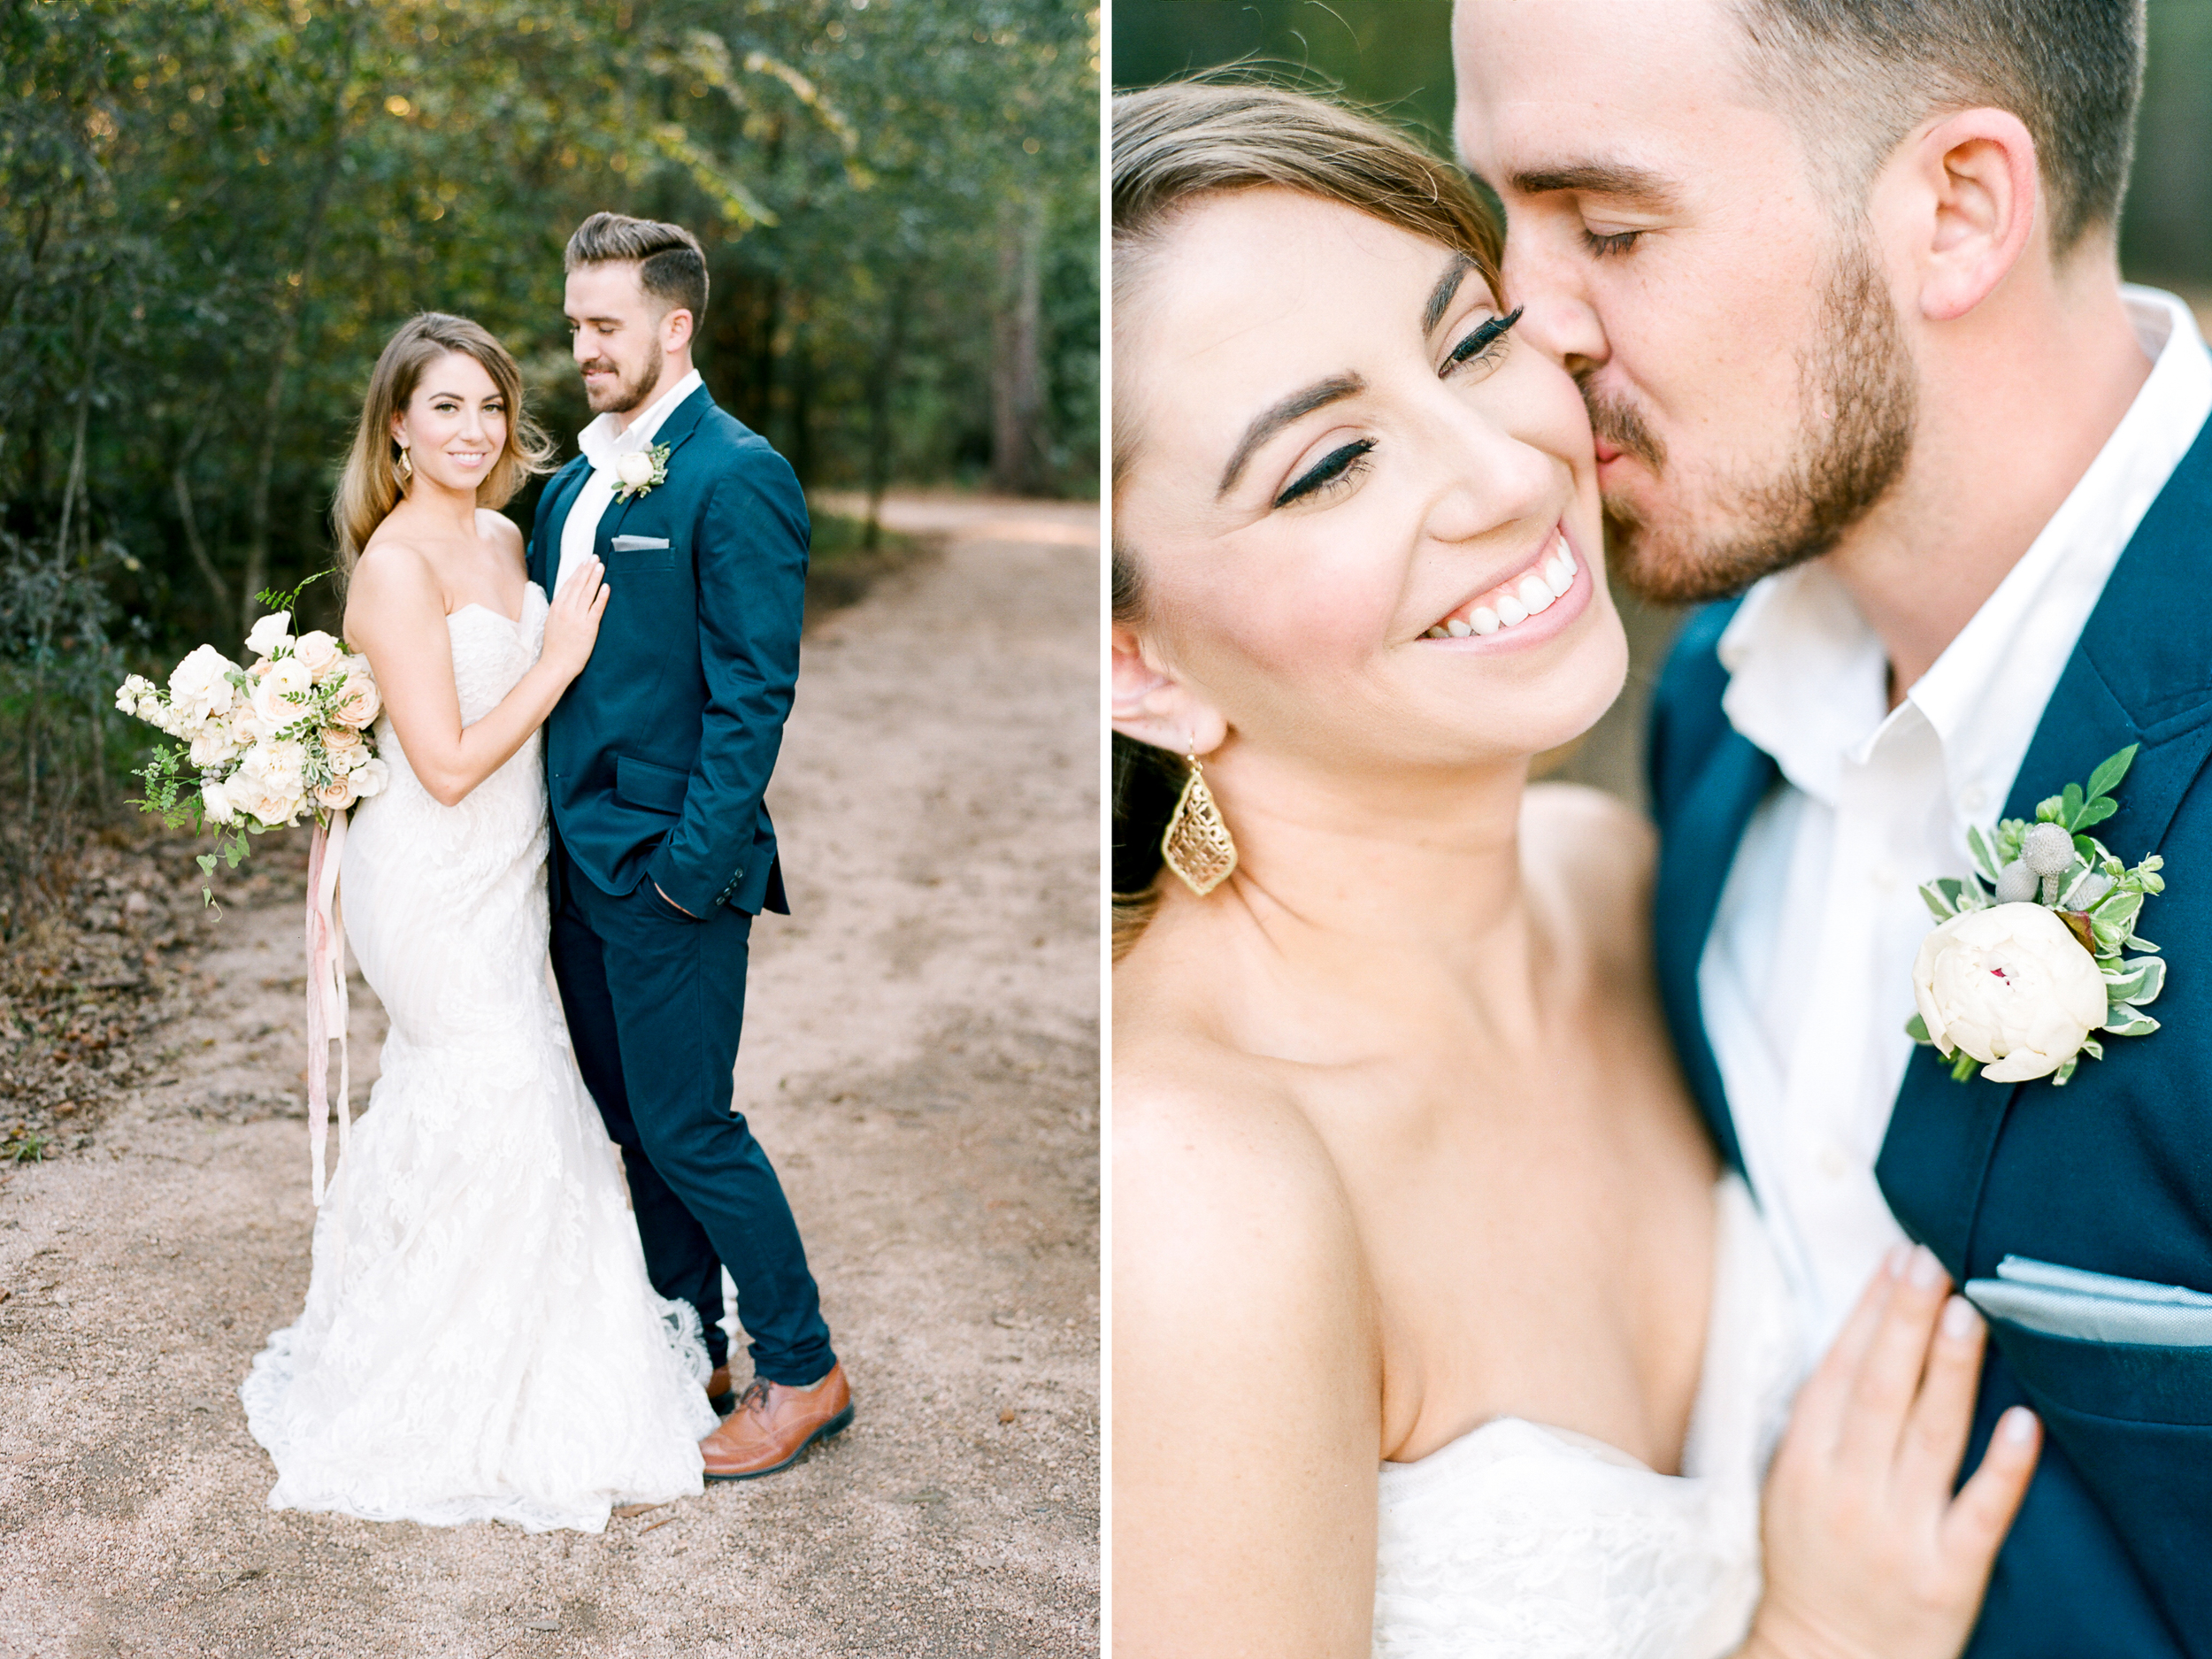 dana-fernandez-photography-the-wedding-chicks-film-houston-wedding-photography-destination-104.jpg